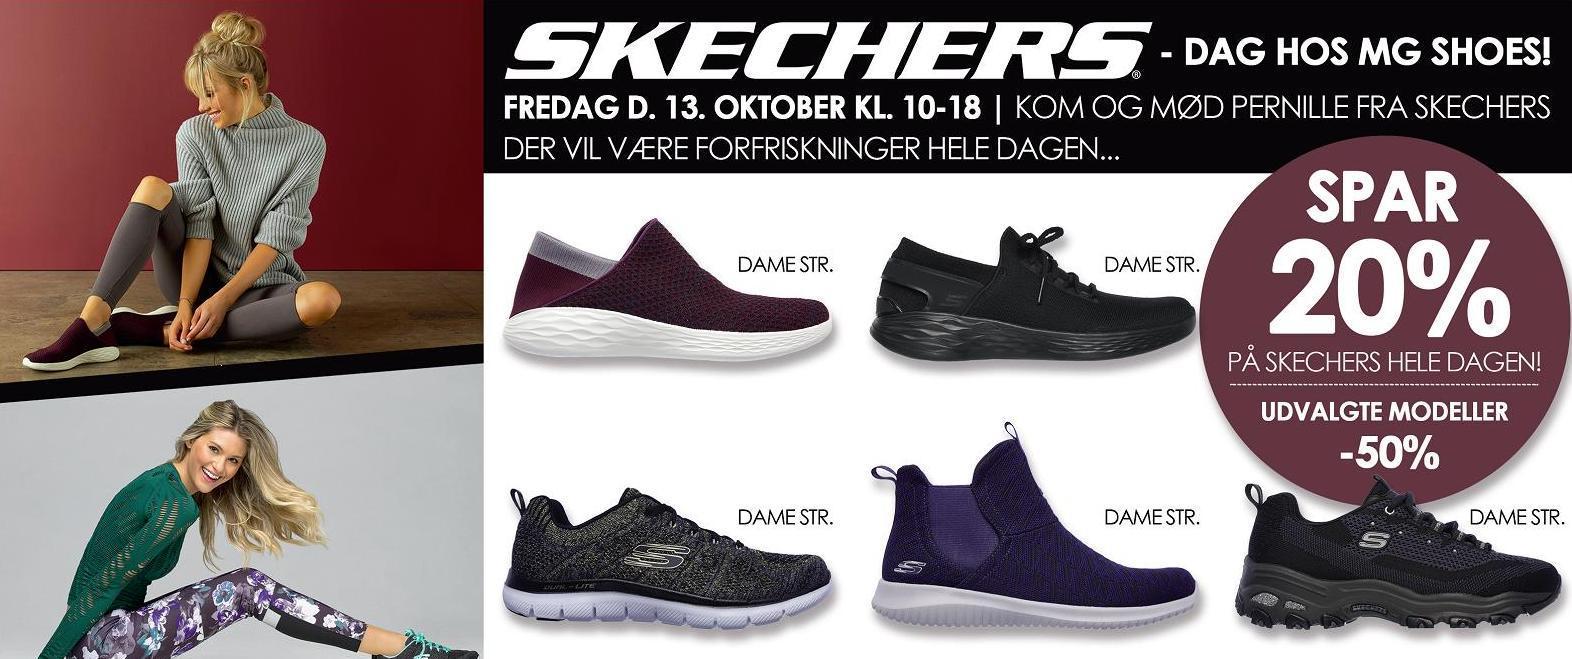 758948397e82 SKECHERS DAG HOS MG SHOES - Søndervig.dk